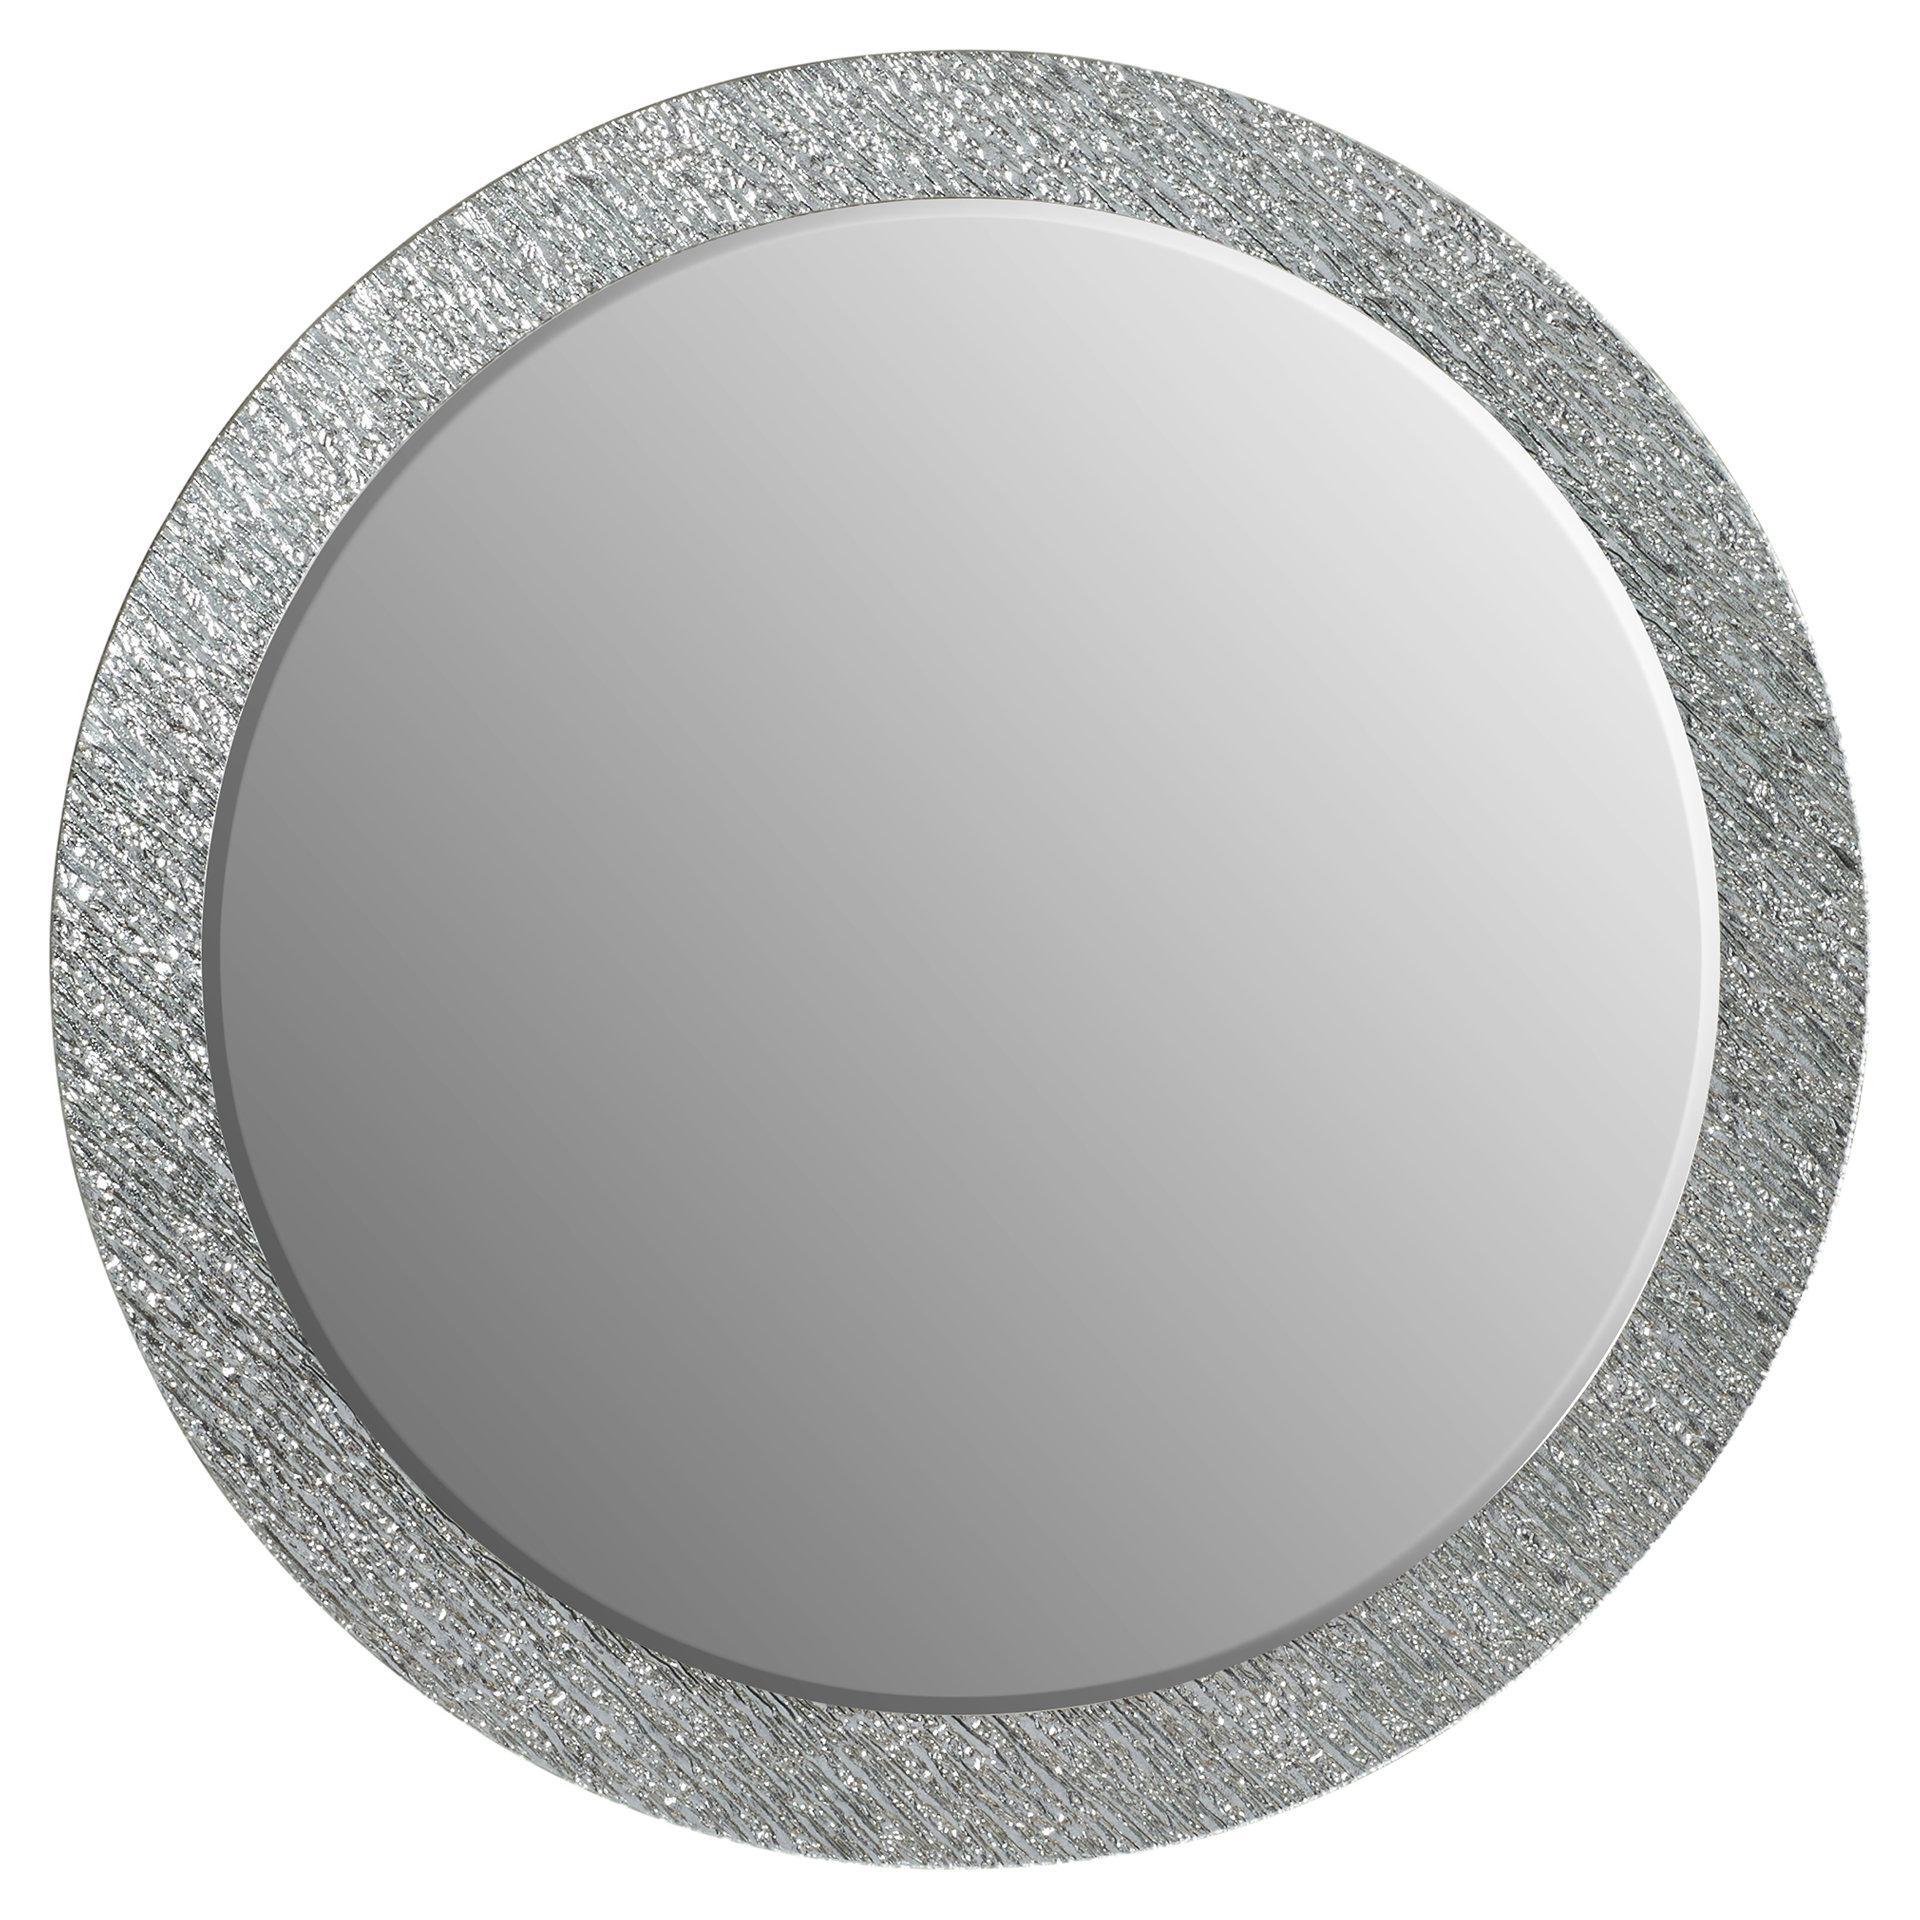 Point Reyes Molten Round Wall Mirror Within Tata Openwork Round Wall Mirrors (View 24 of 30)